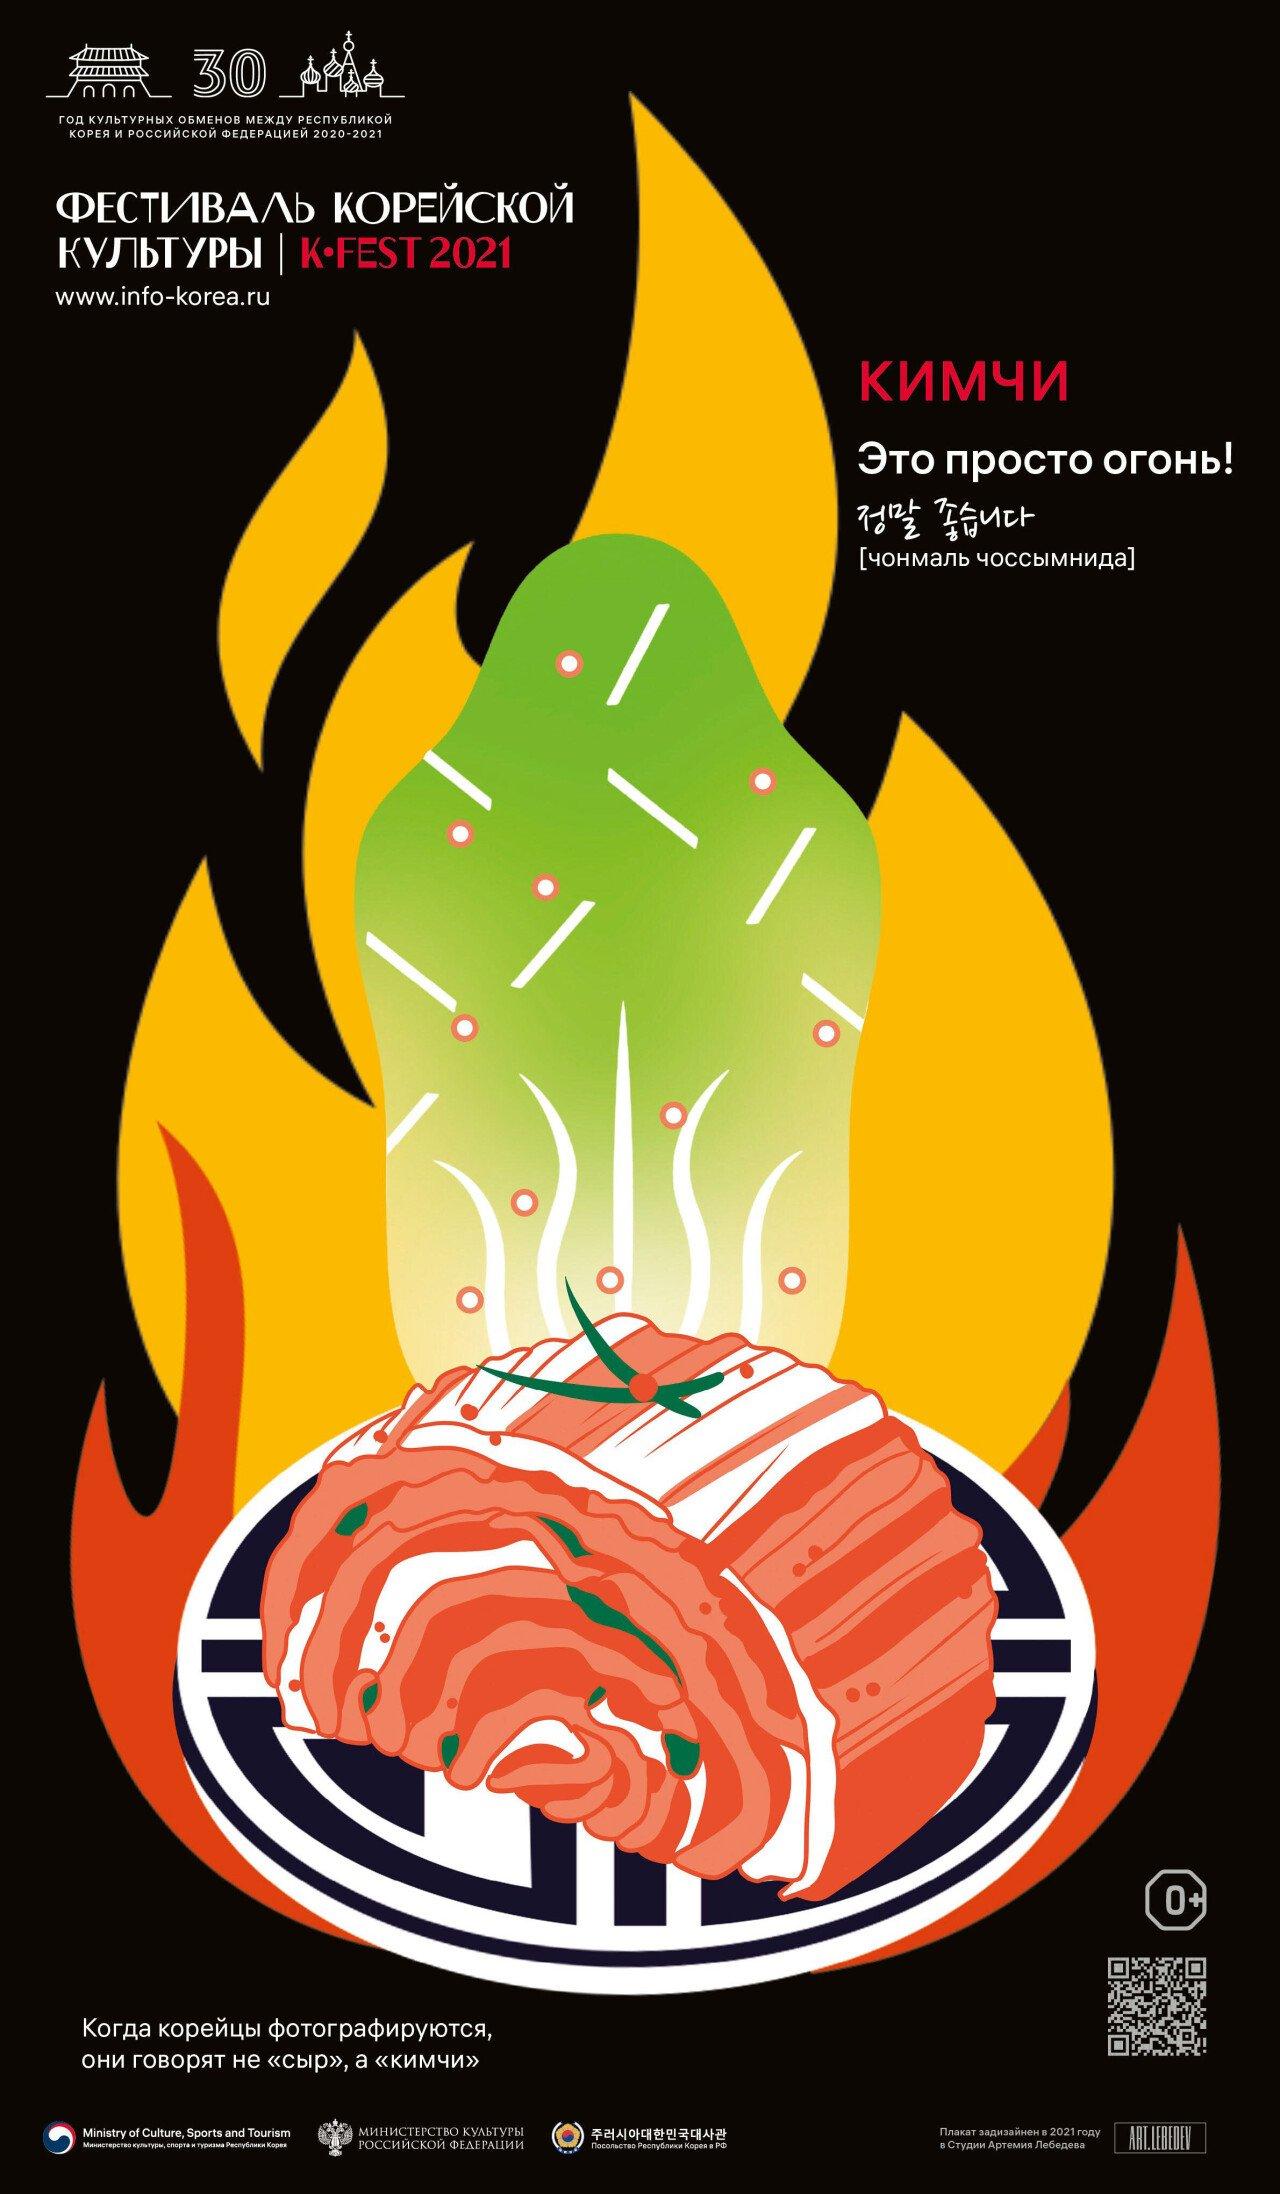 11.jpg 러시아가 공개한 한국 수교 30주년 포스터 ㄷㄷㄷ.jpg